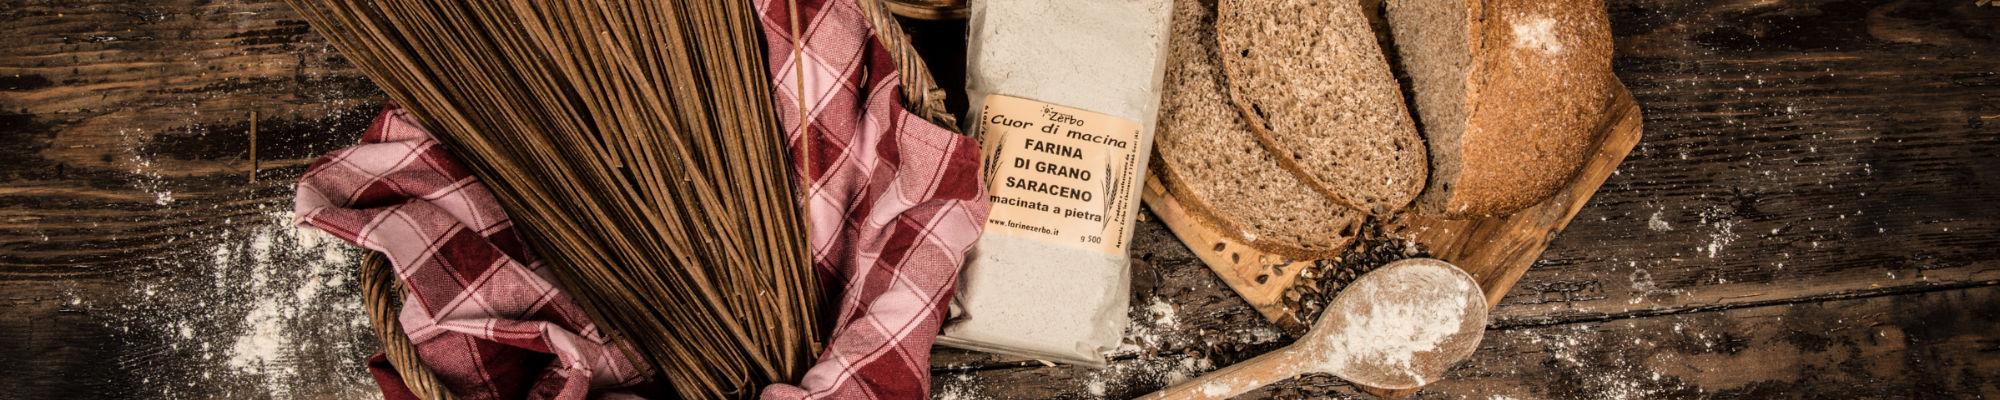 banner grano saraceno